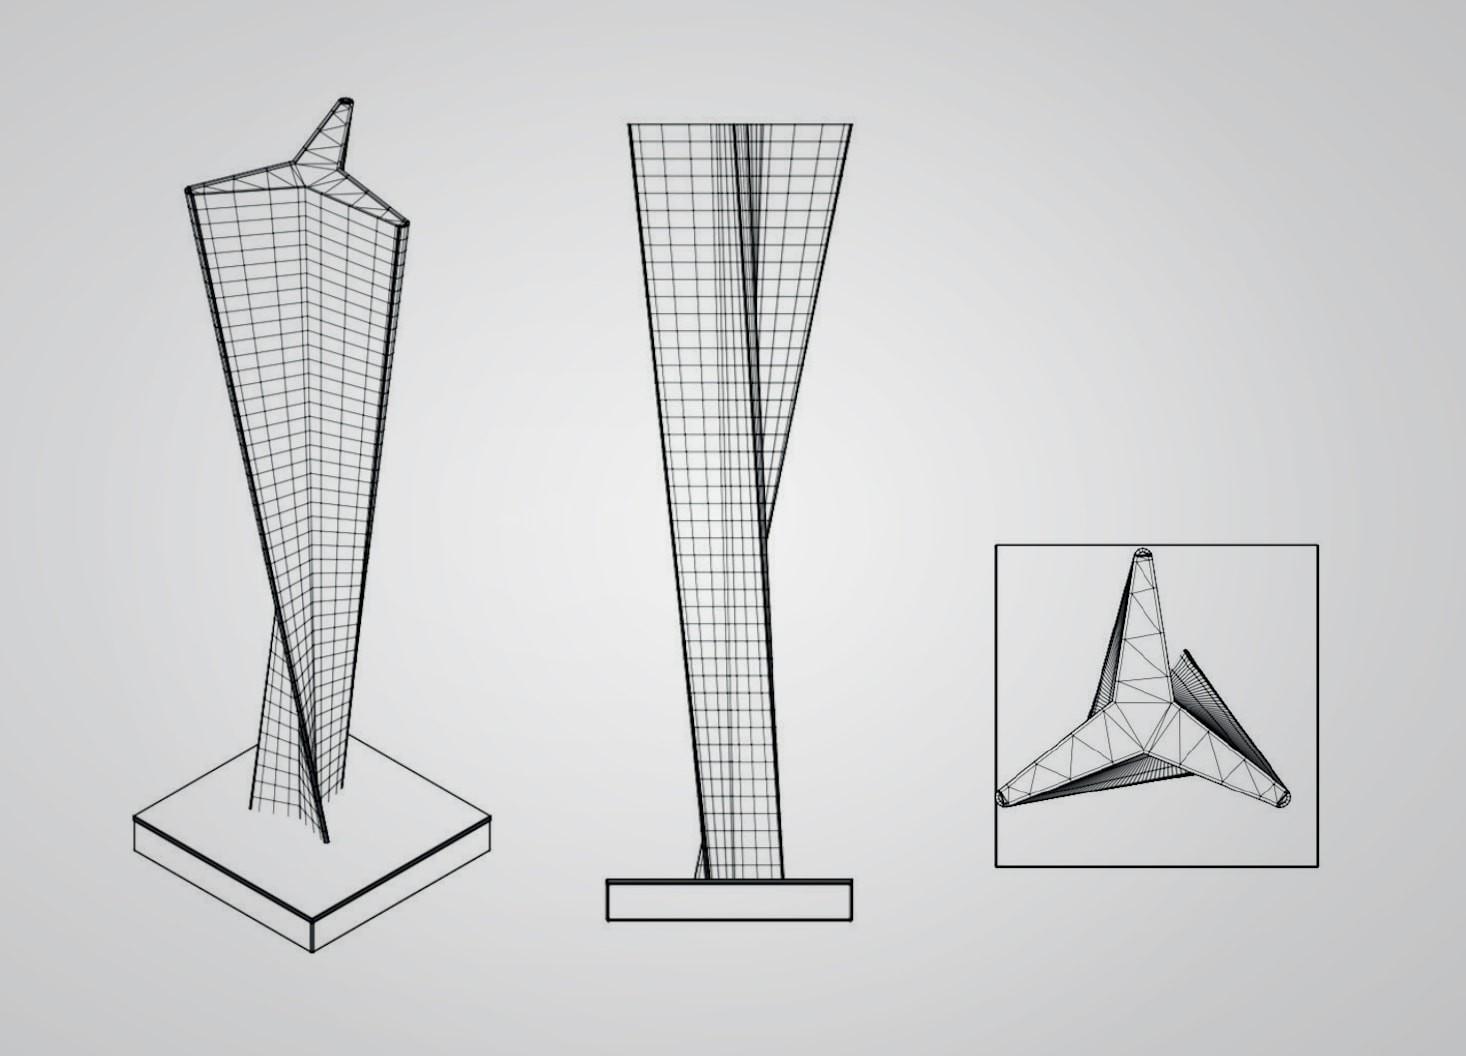 Mercedes-Benz Twisted Trophy - Hatch Design - Digital Creative Agency